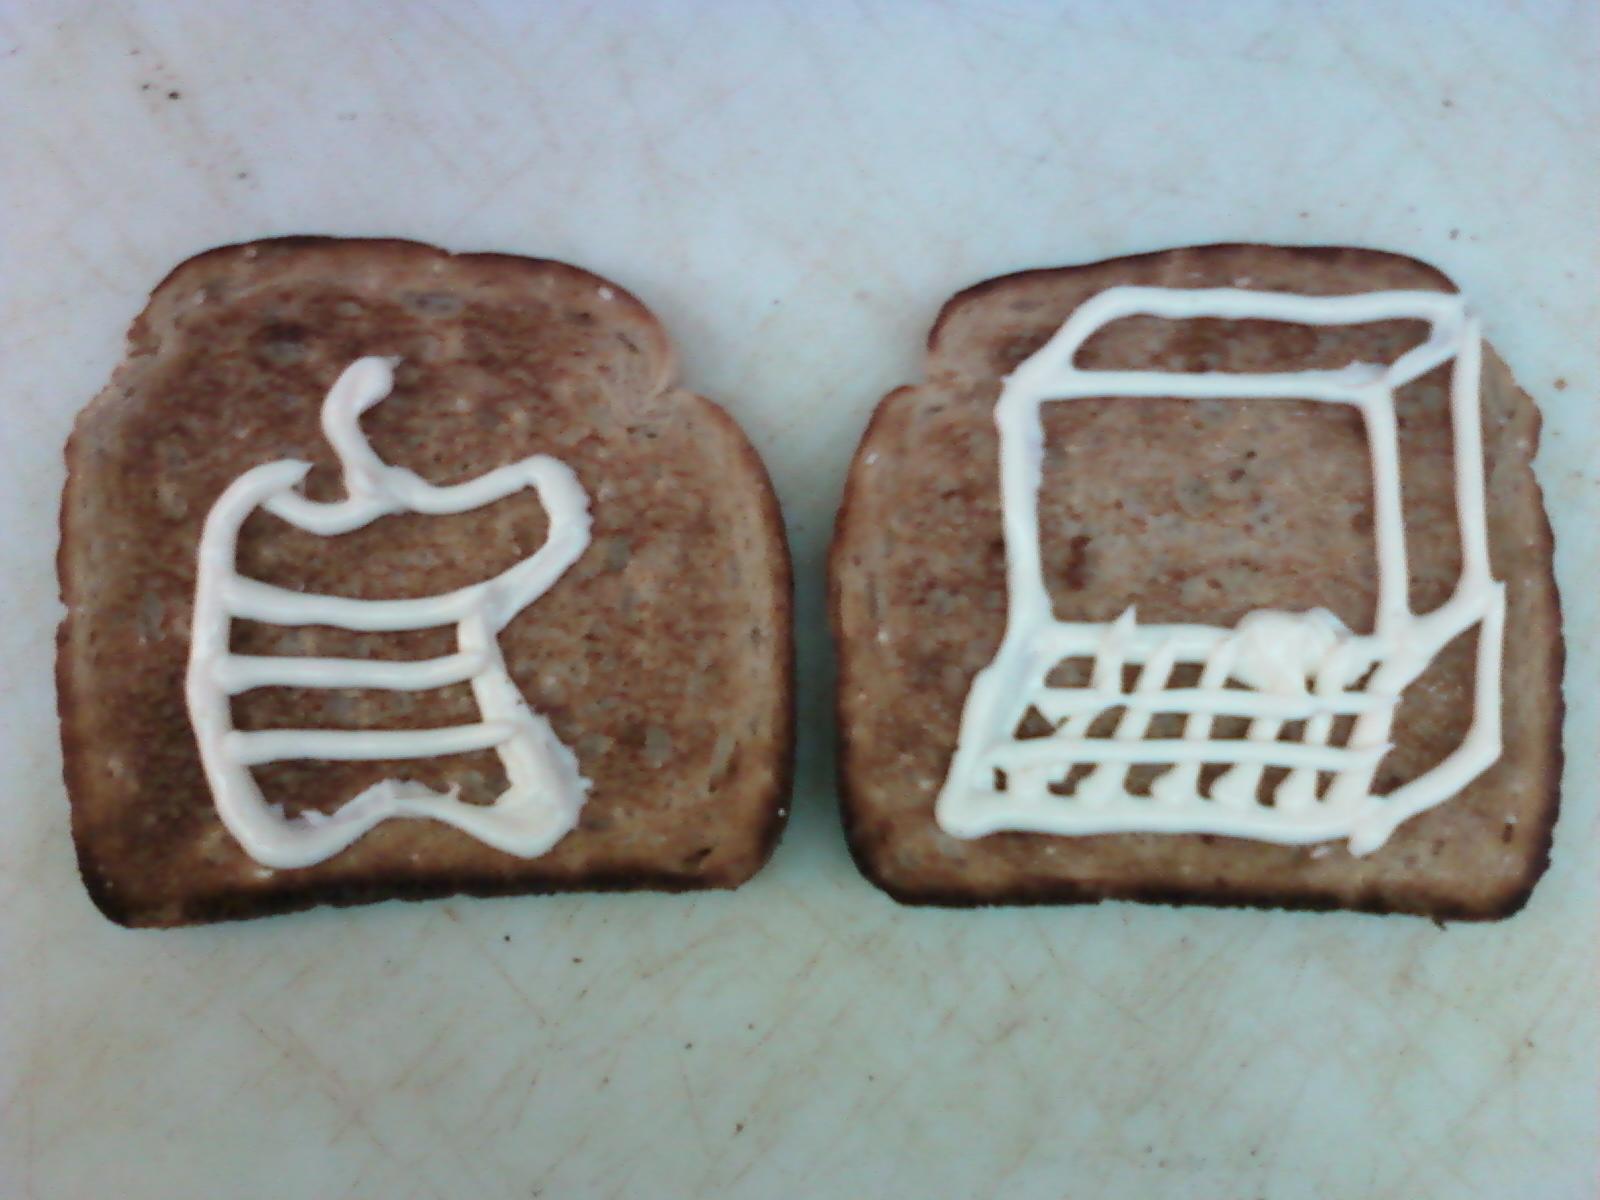 sandwich_art/1006110753.jpg